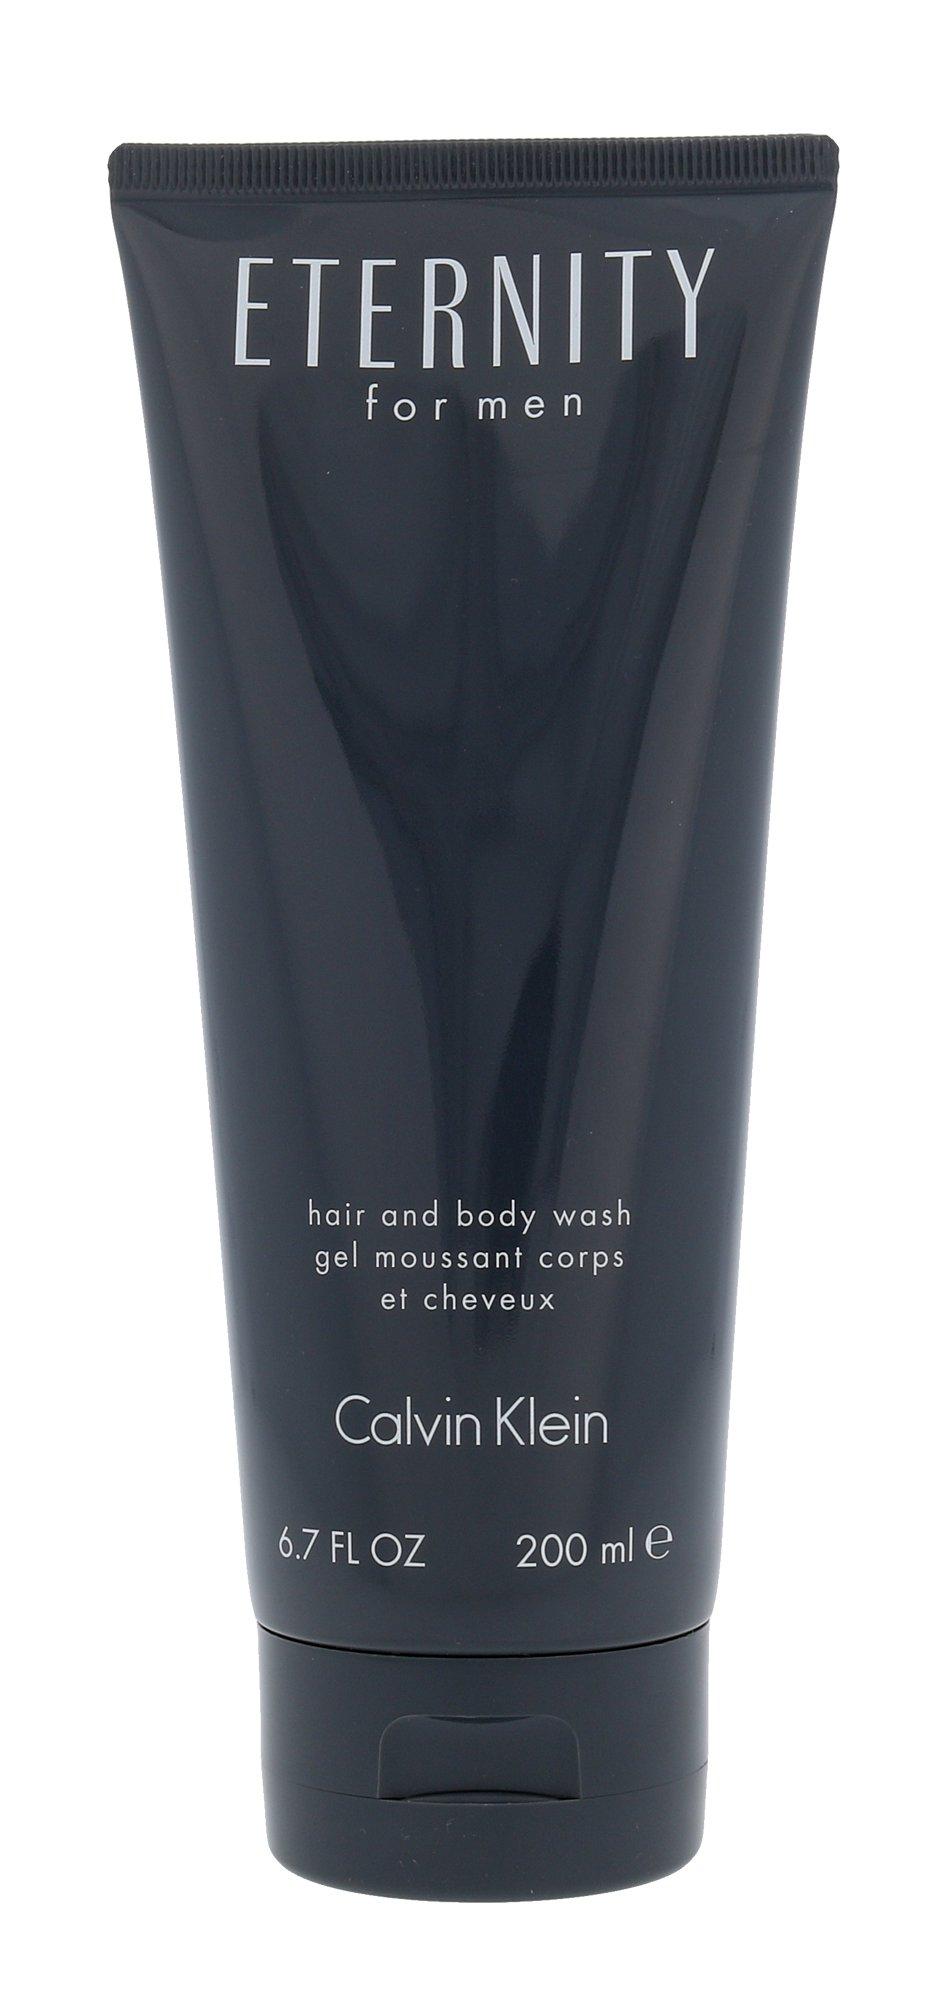 Calvin Klein Eternity, Sprchovací gél 200ml - For Men